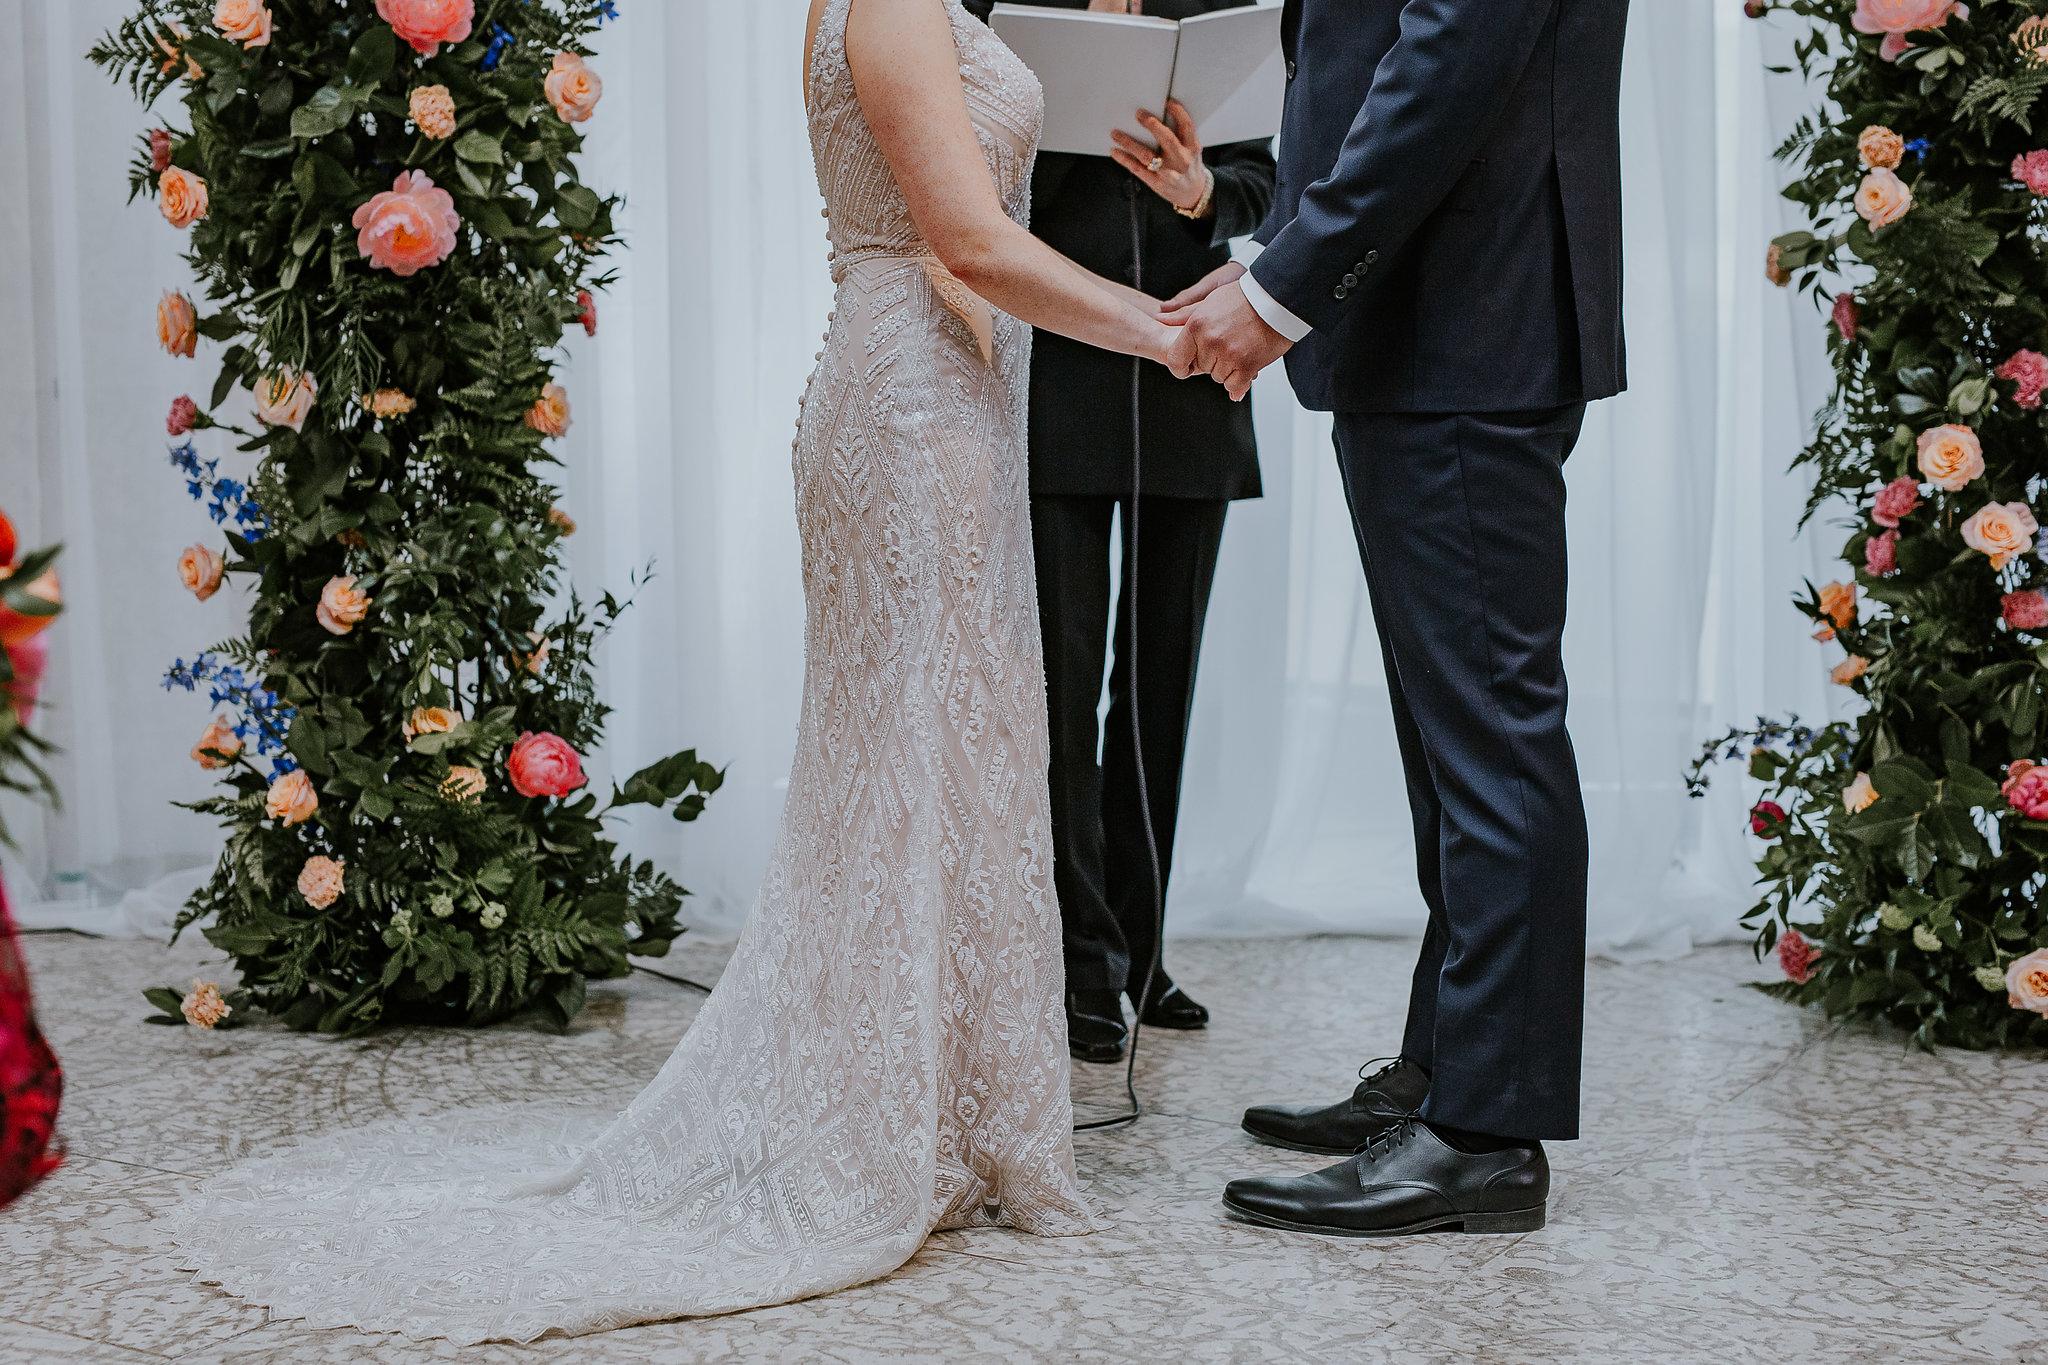 Deconstructed Wedding Ceremony Arch - Wedding Ceremony Flowers